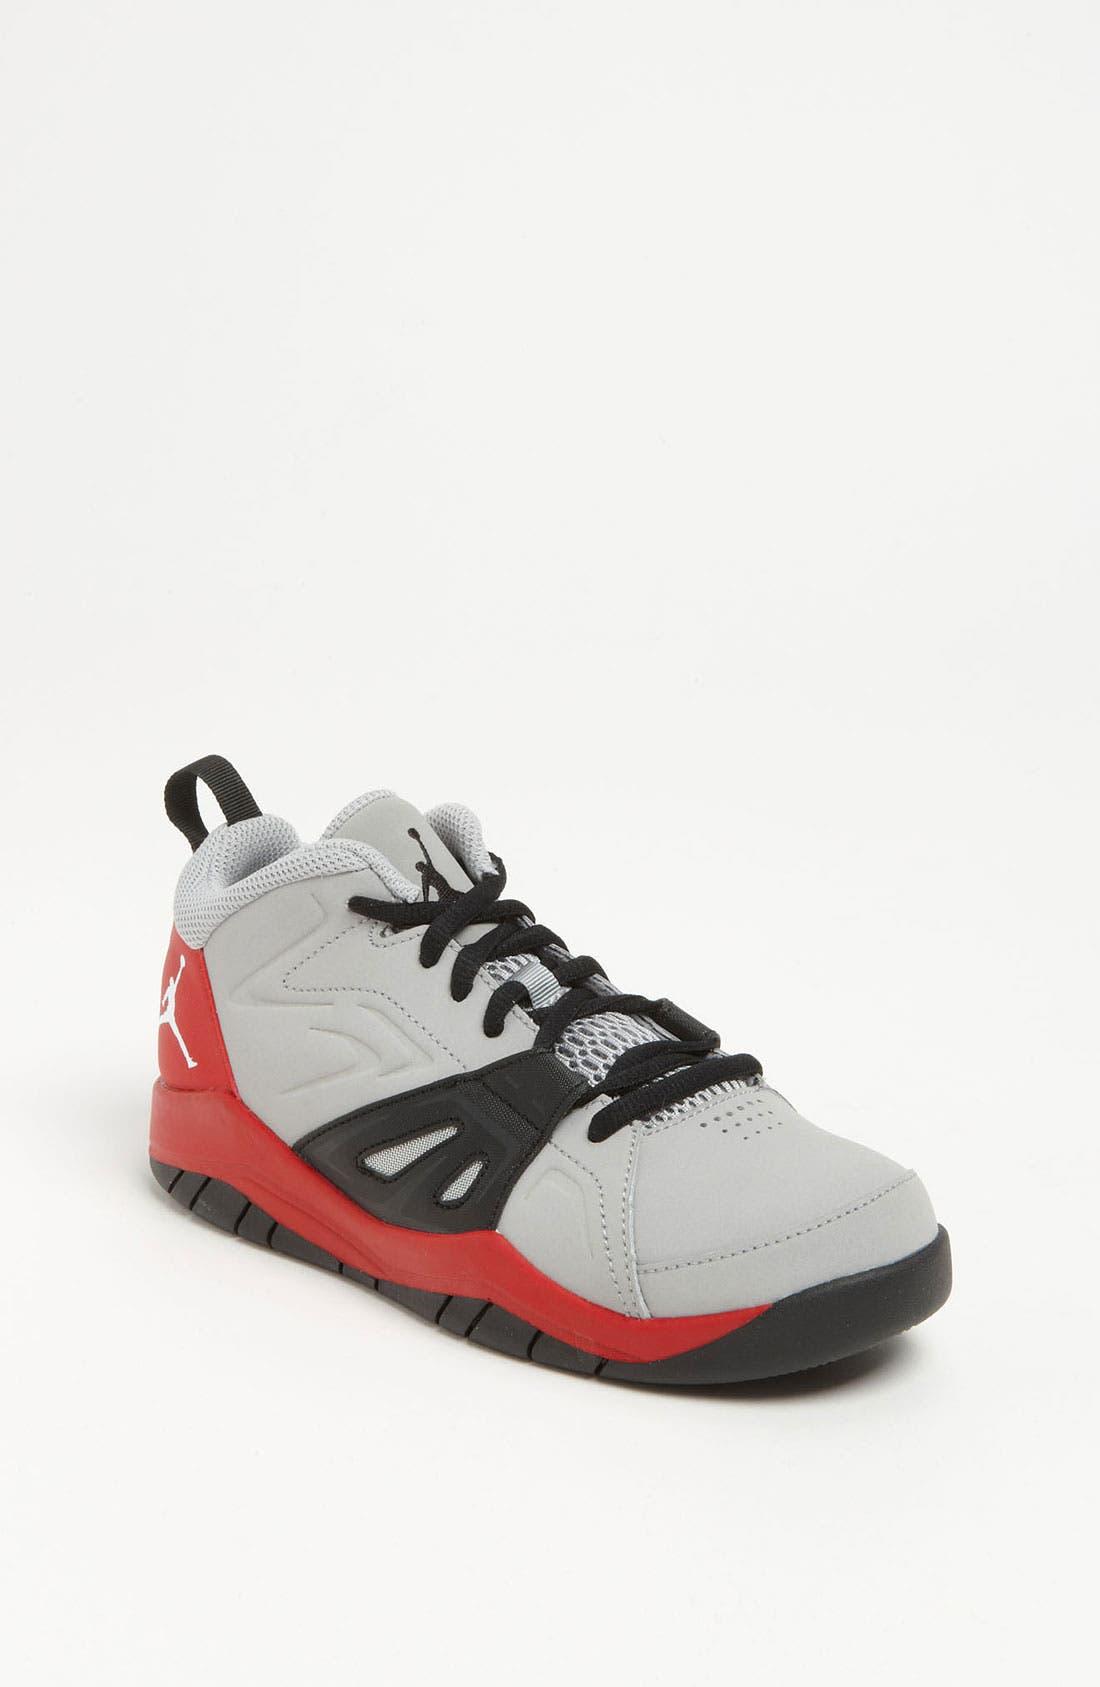 Alternate Image 1 Selected - Nike 'Jordan Ace 23' Basketball Shoe (Toddler & Little Kid)